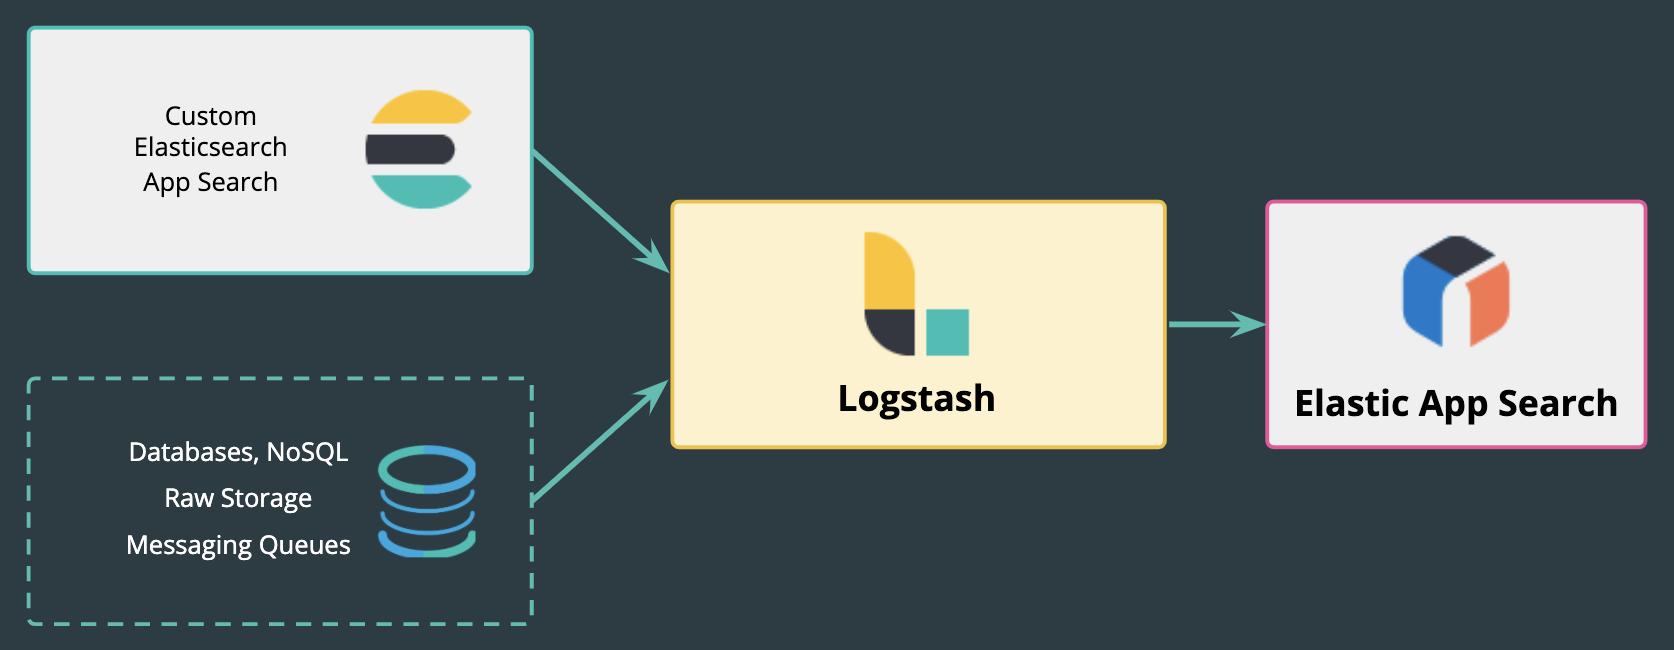 logstash-app-search-blog.png